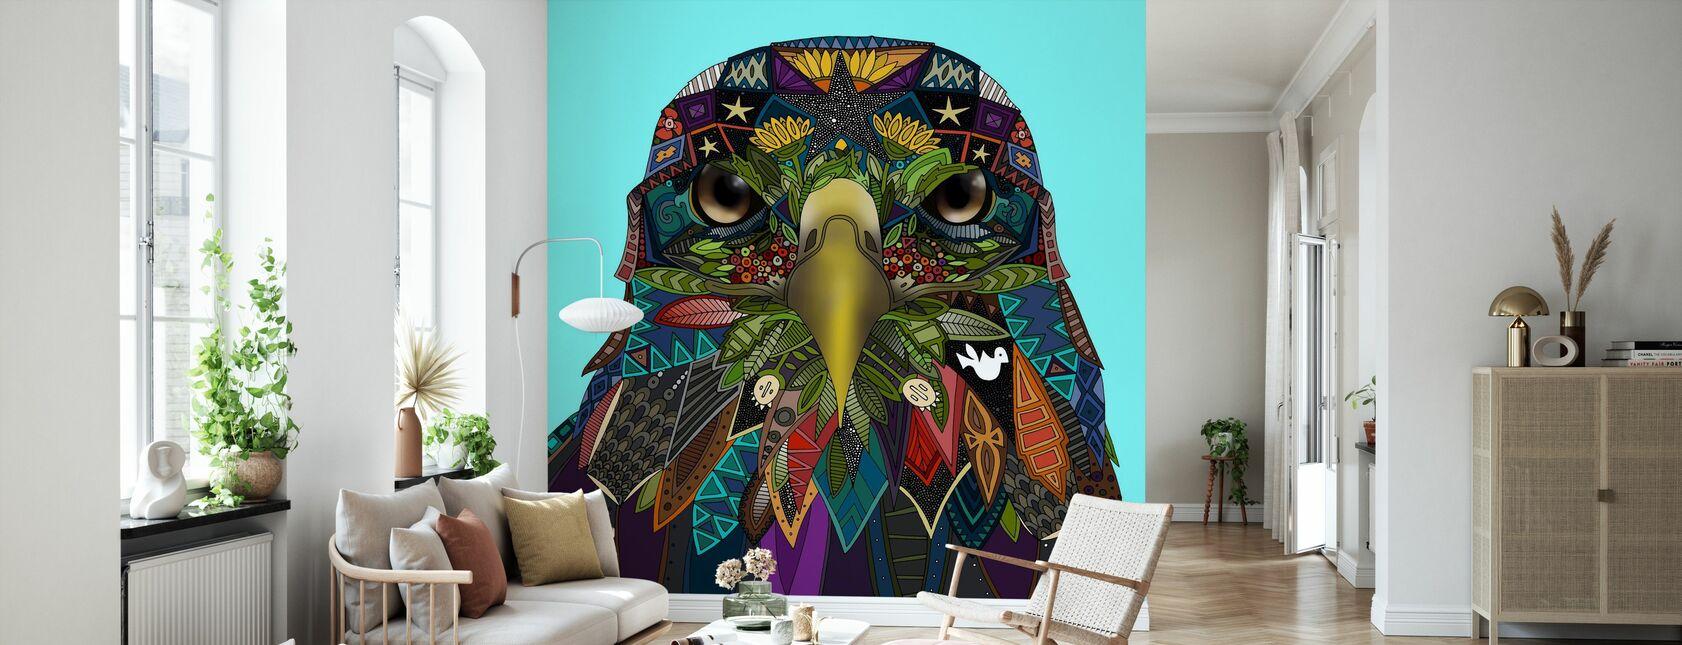 American Eagle - Wallpaper - Living Room